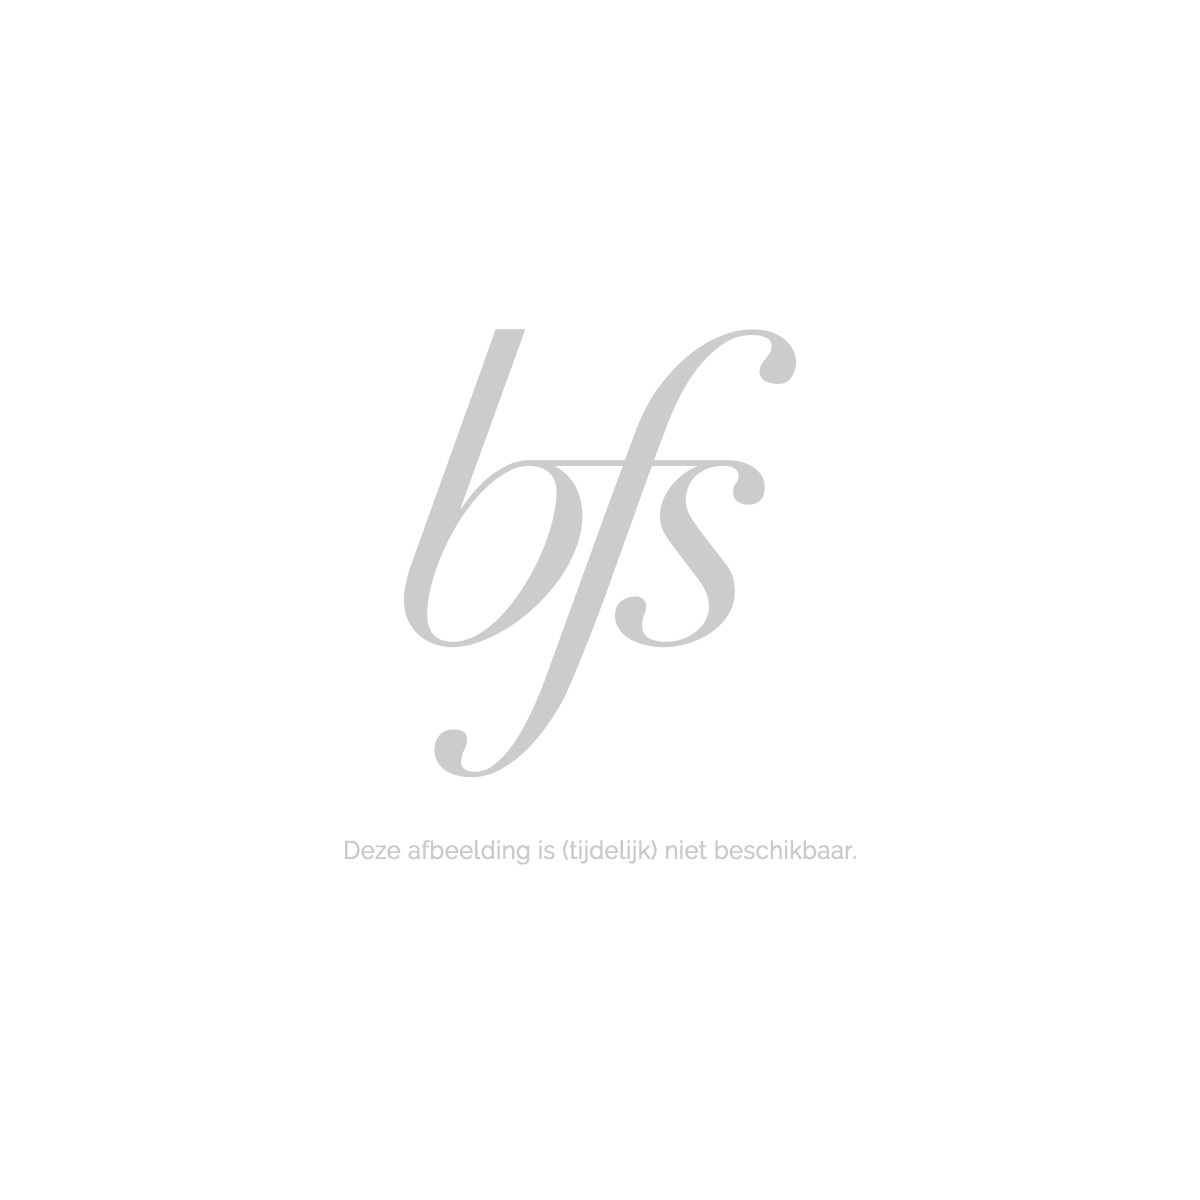 Yves Saint Laurent Black Opium Intense For Women Eau De Parfum Spray 30 Ml